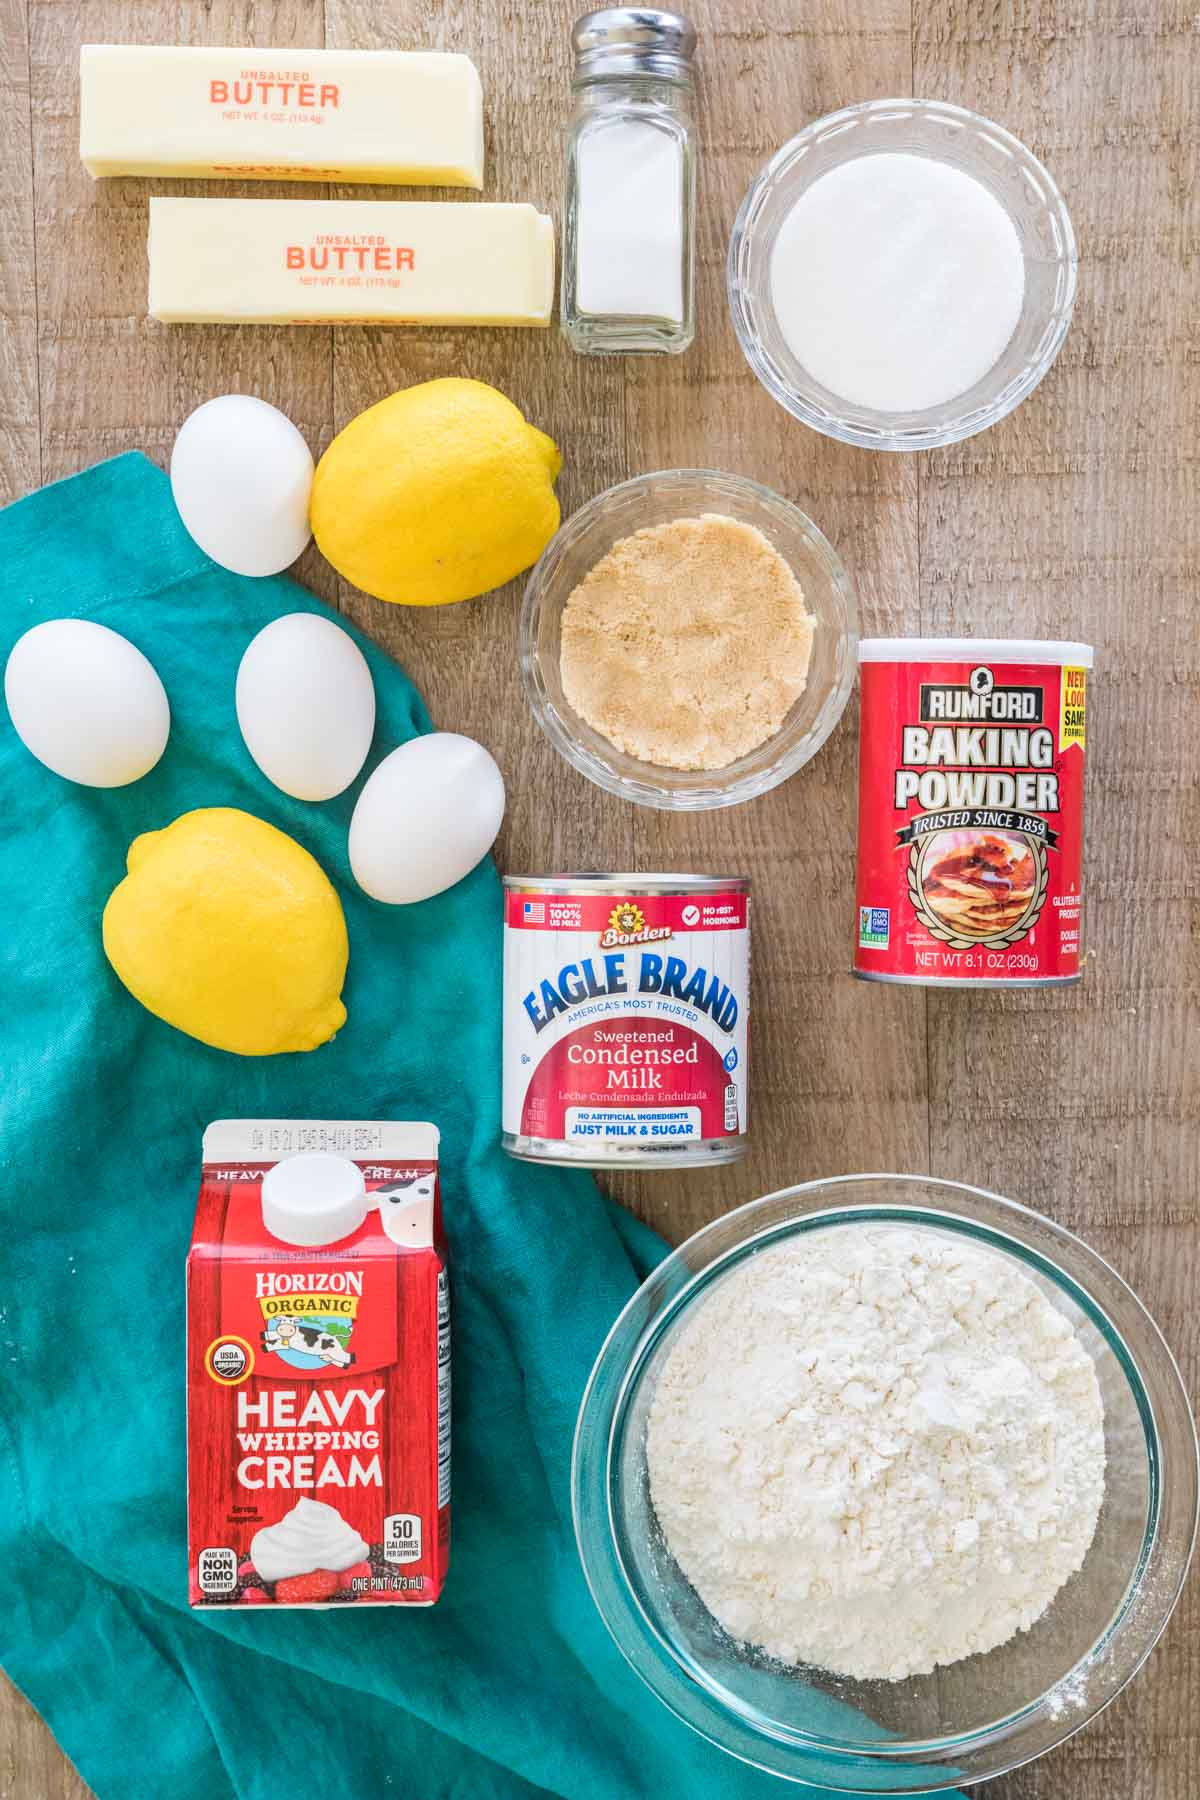 Butter, salt, granulated sugar, eggs, lemons, brown sugar, baking powder, sweetened condensed milk, heavy whipping cream, and flour.